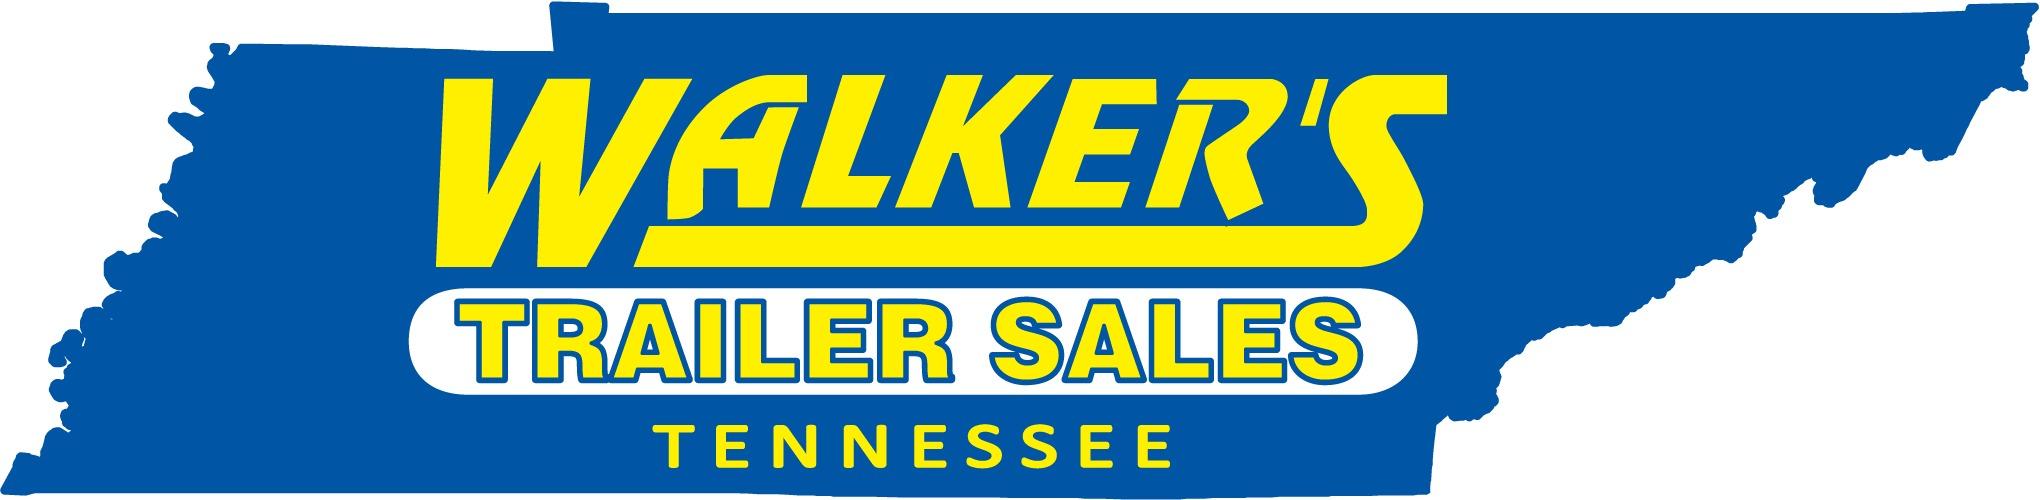 Walker's Trailer Sales LLC